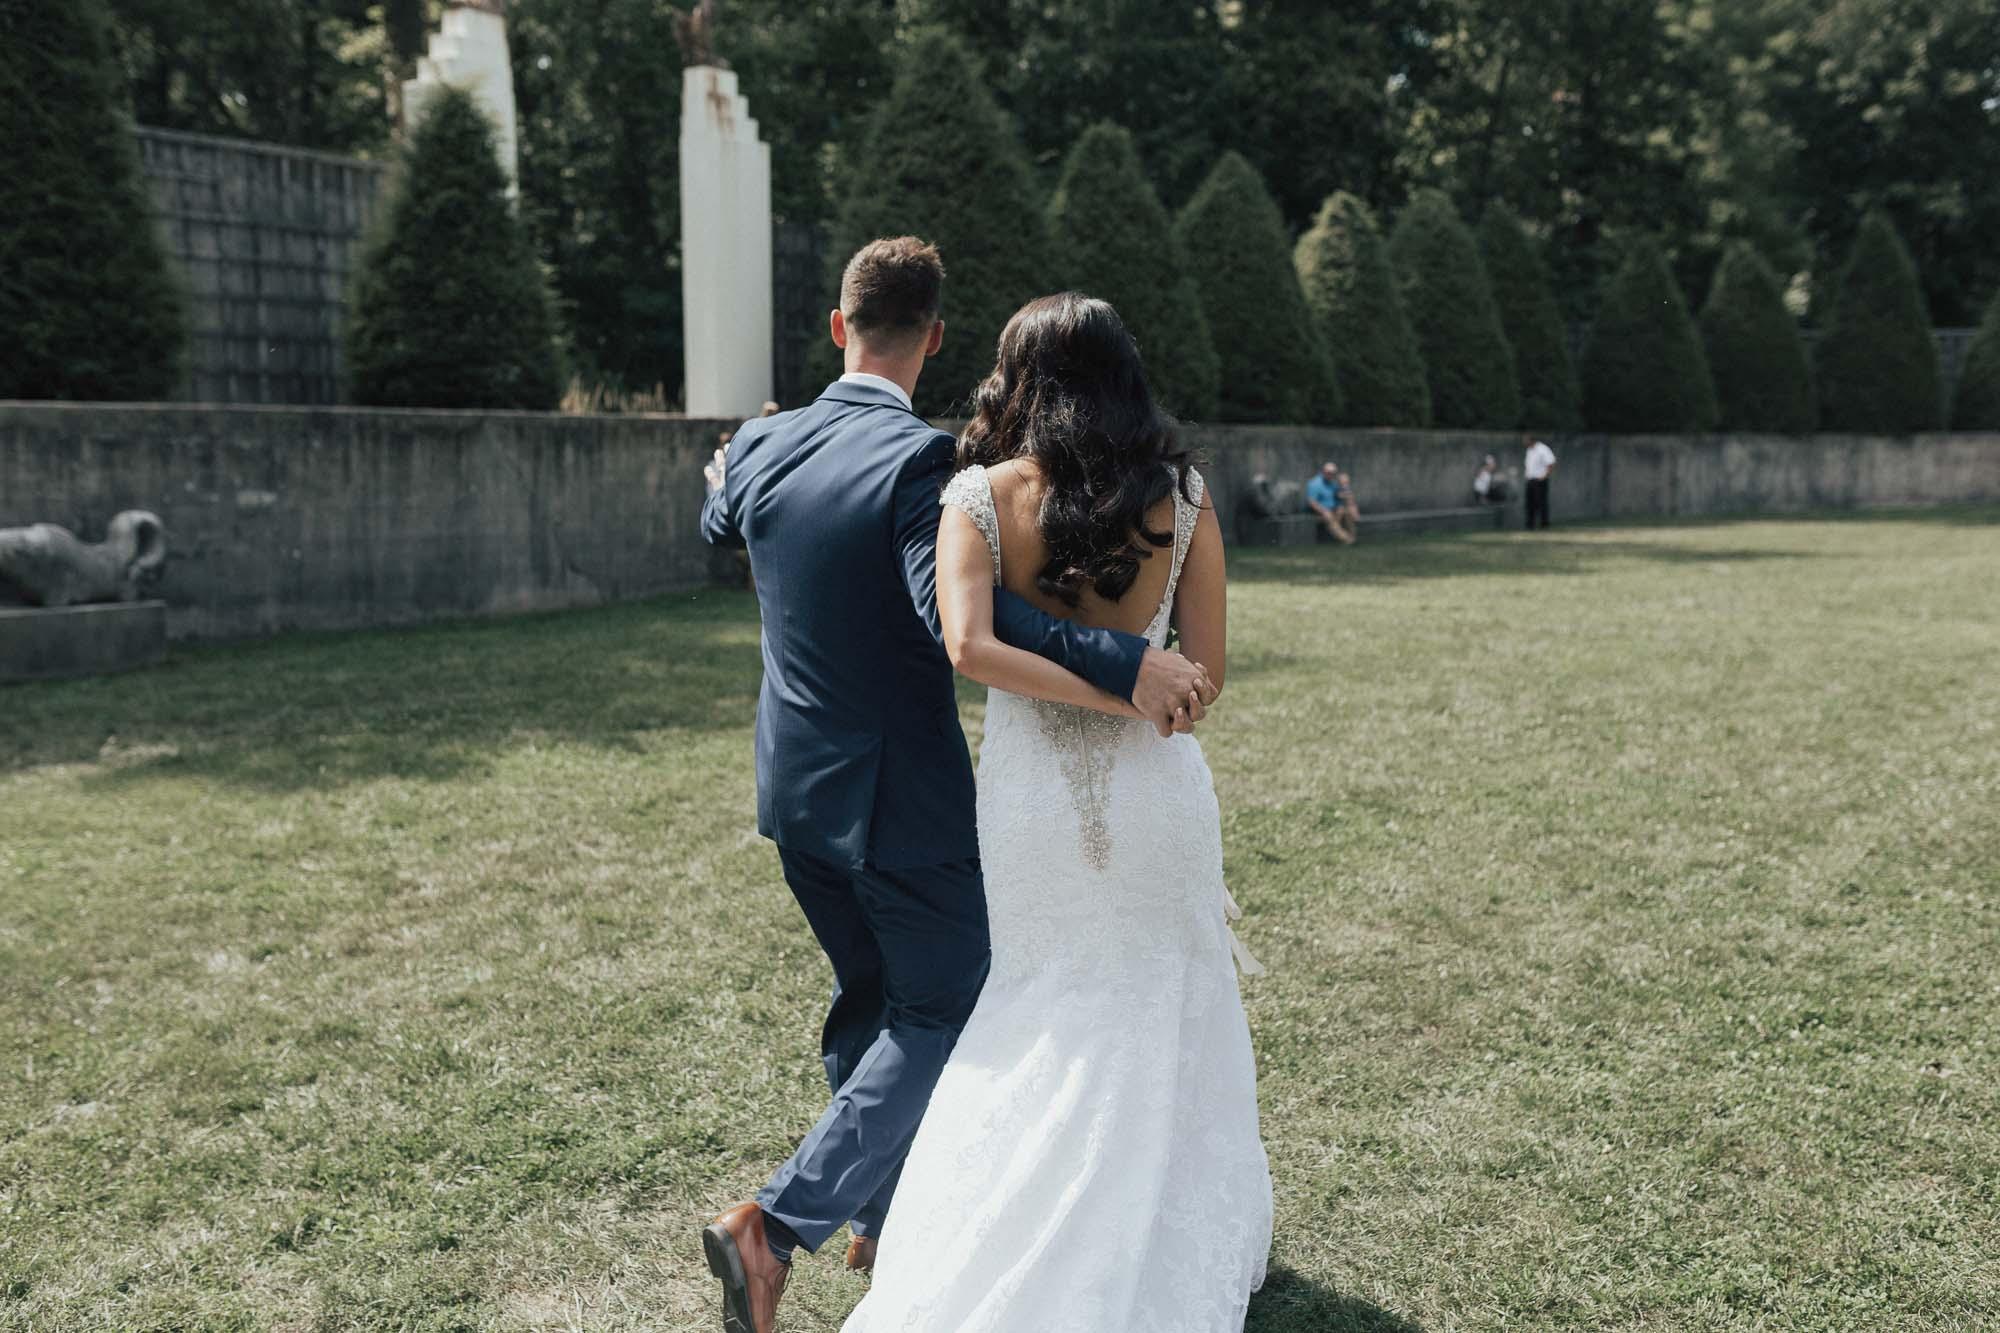 champaign_il_wedding_photography-0345.jpg